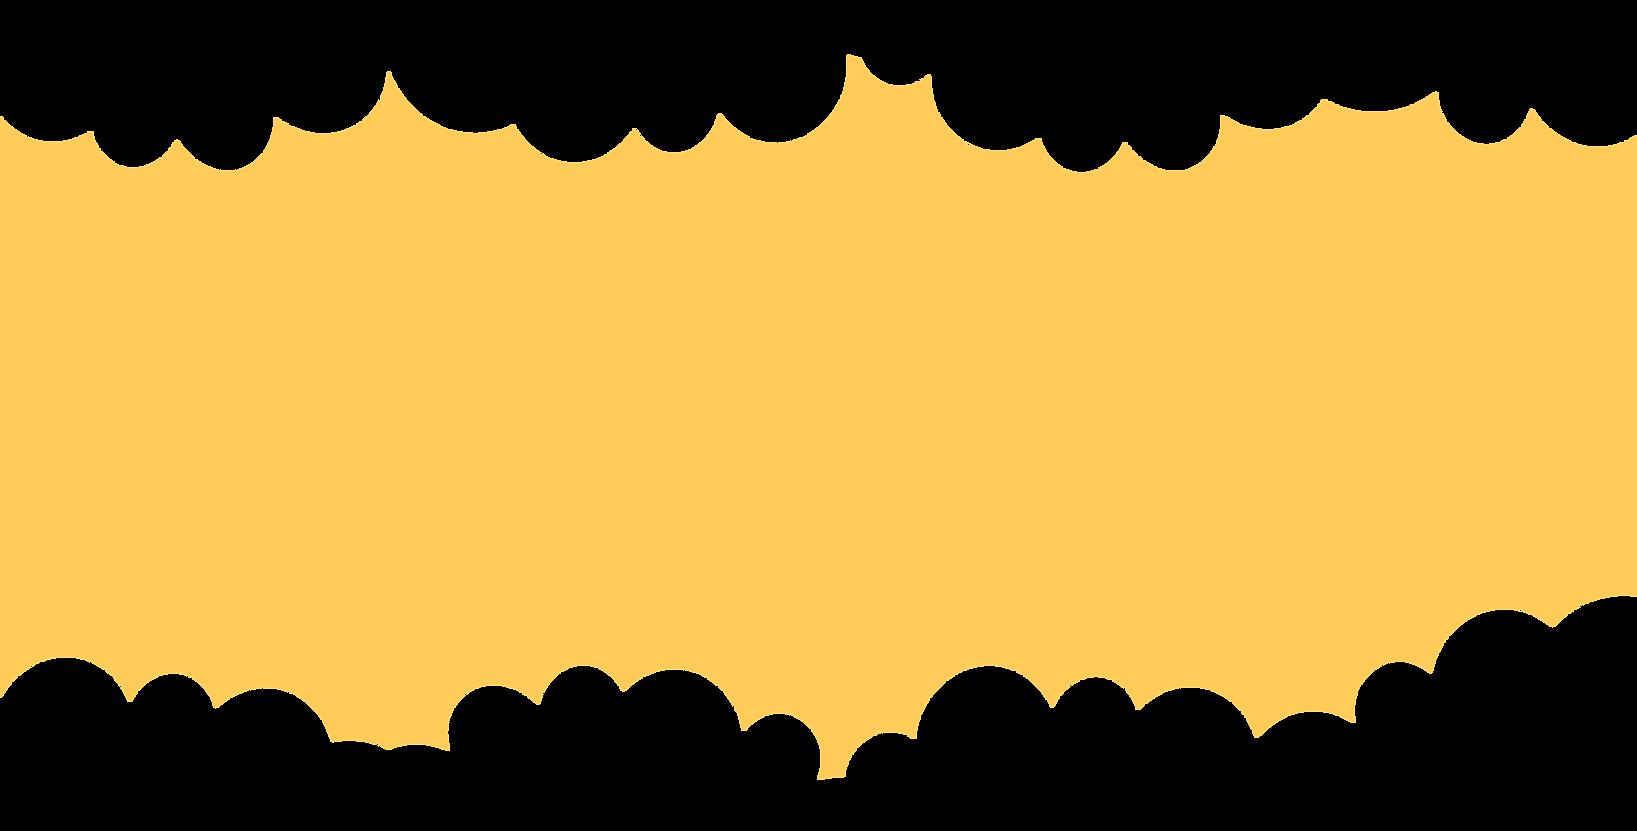 cloud inverse-61.png